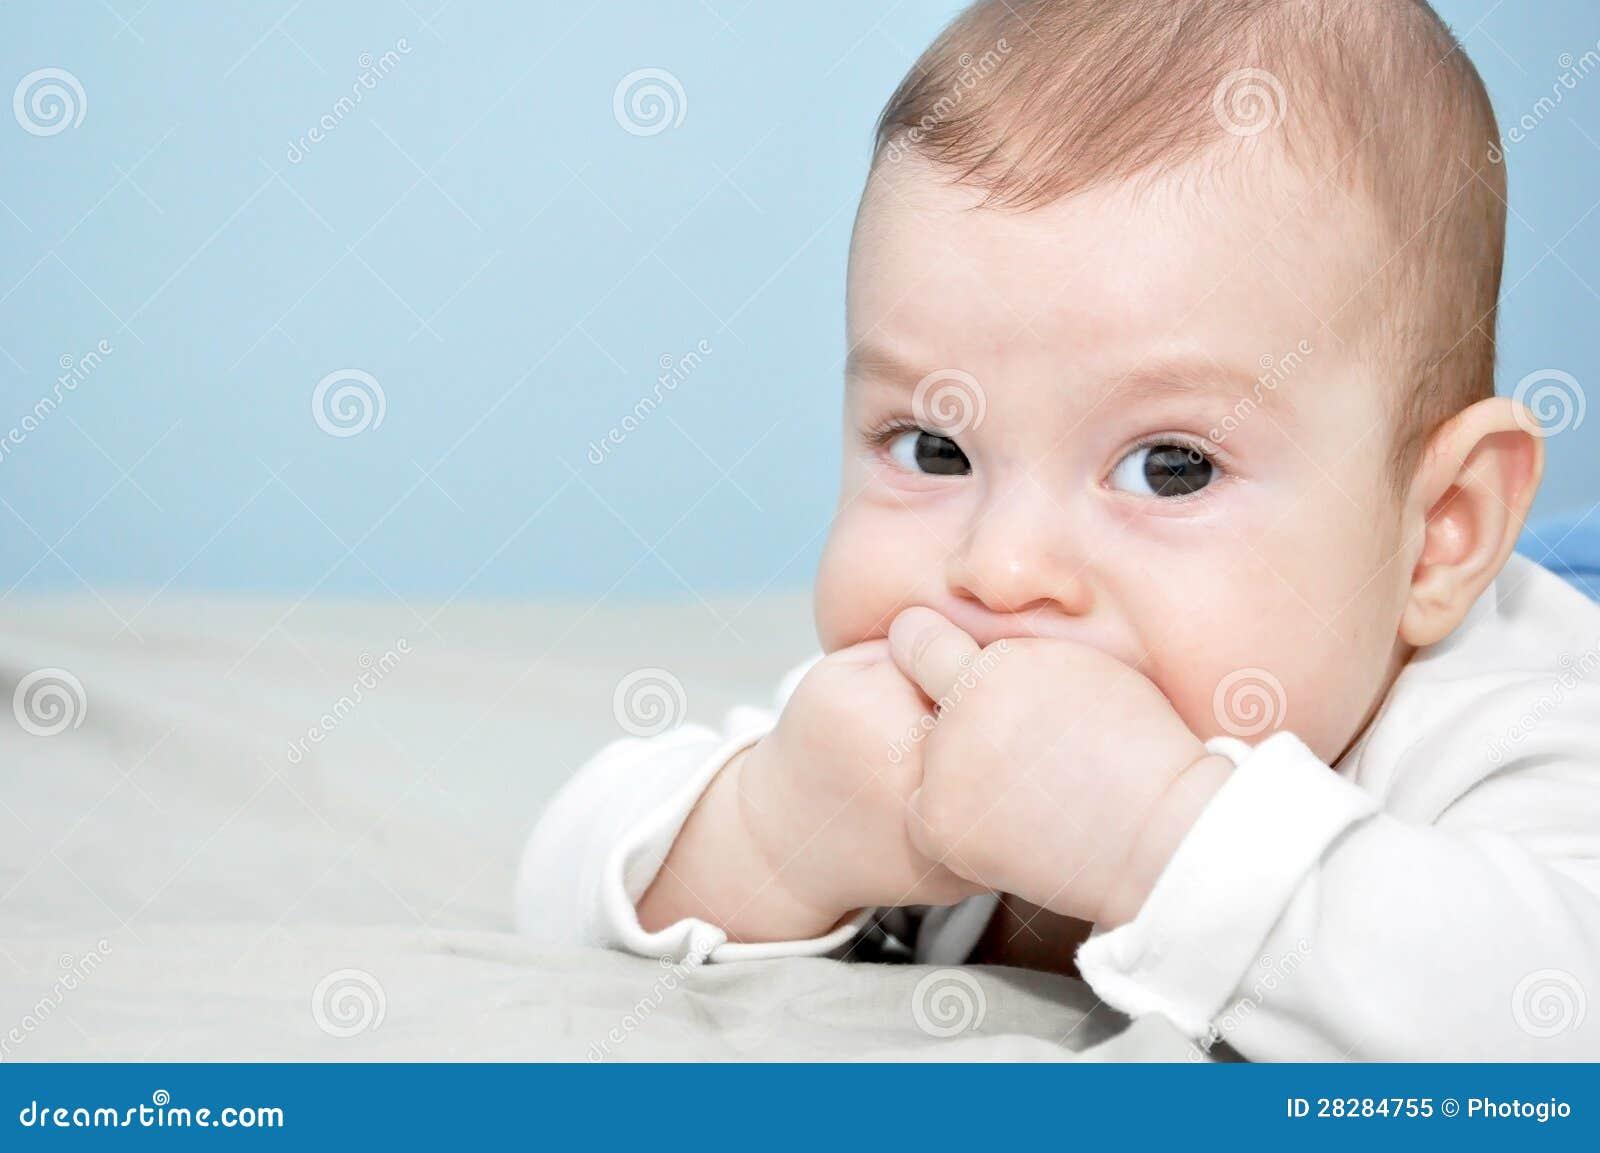 Baby Boy Posing Royalty Free Stock Photo - Image: 28284755 Newborn Boy Photography Poses